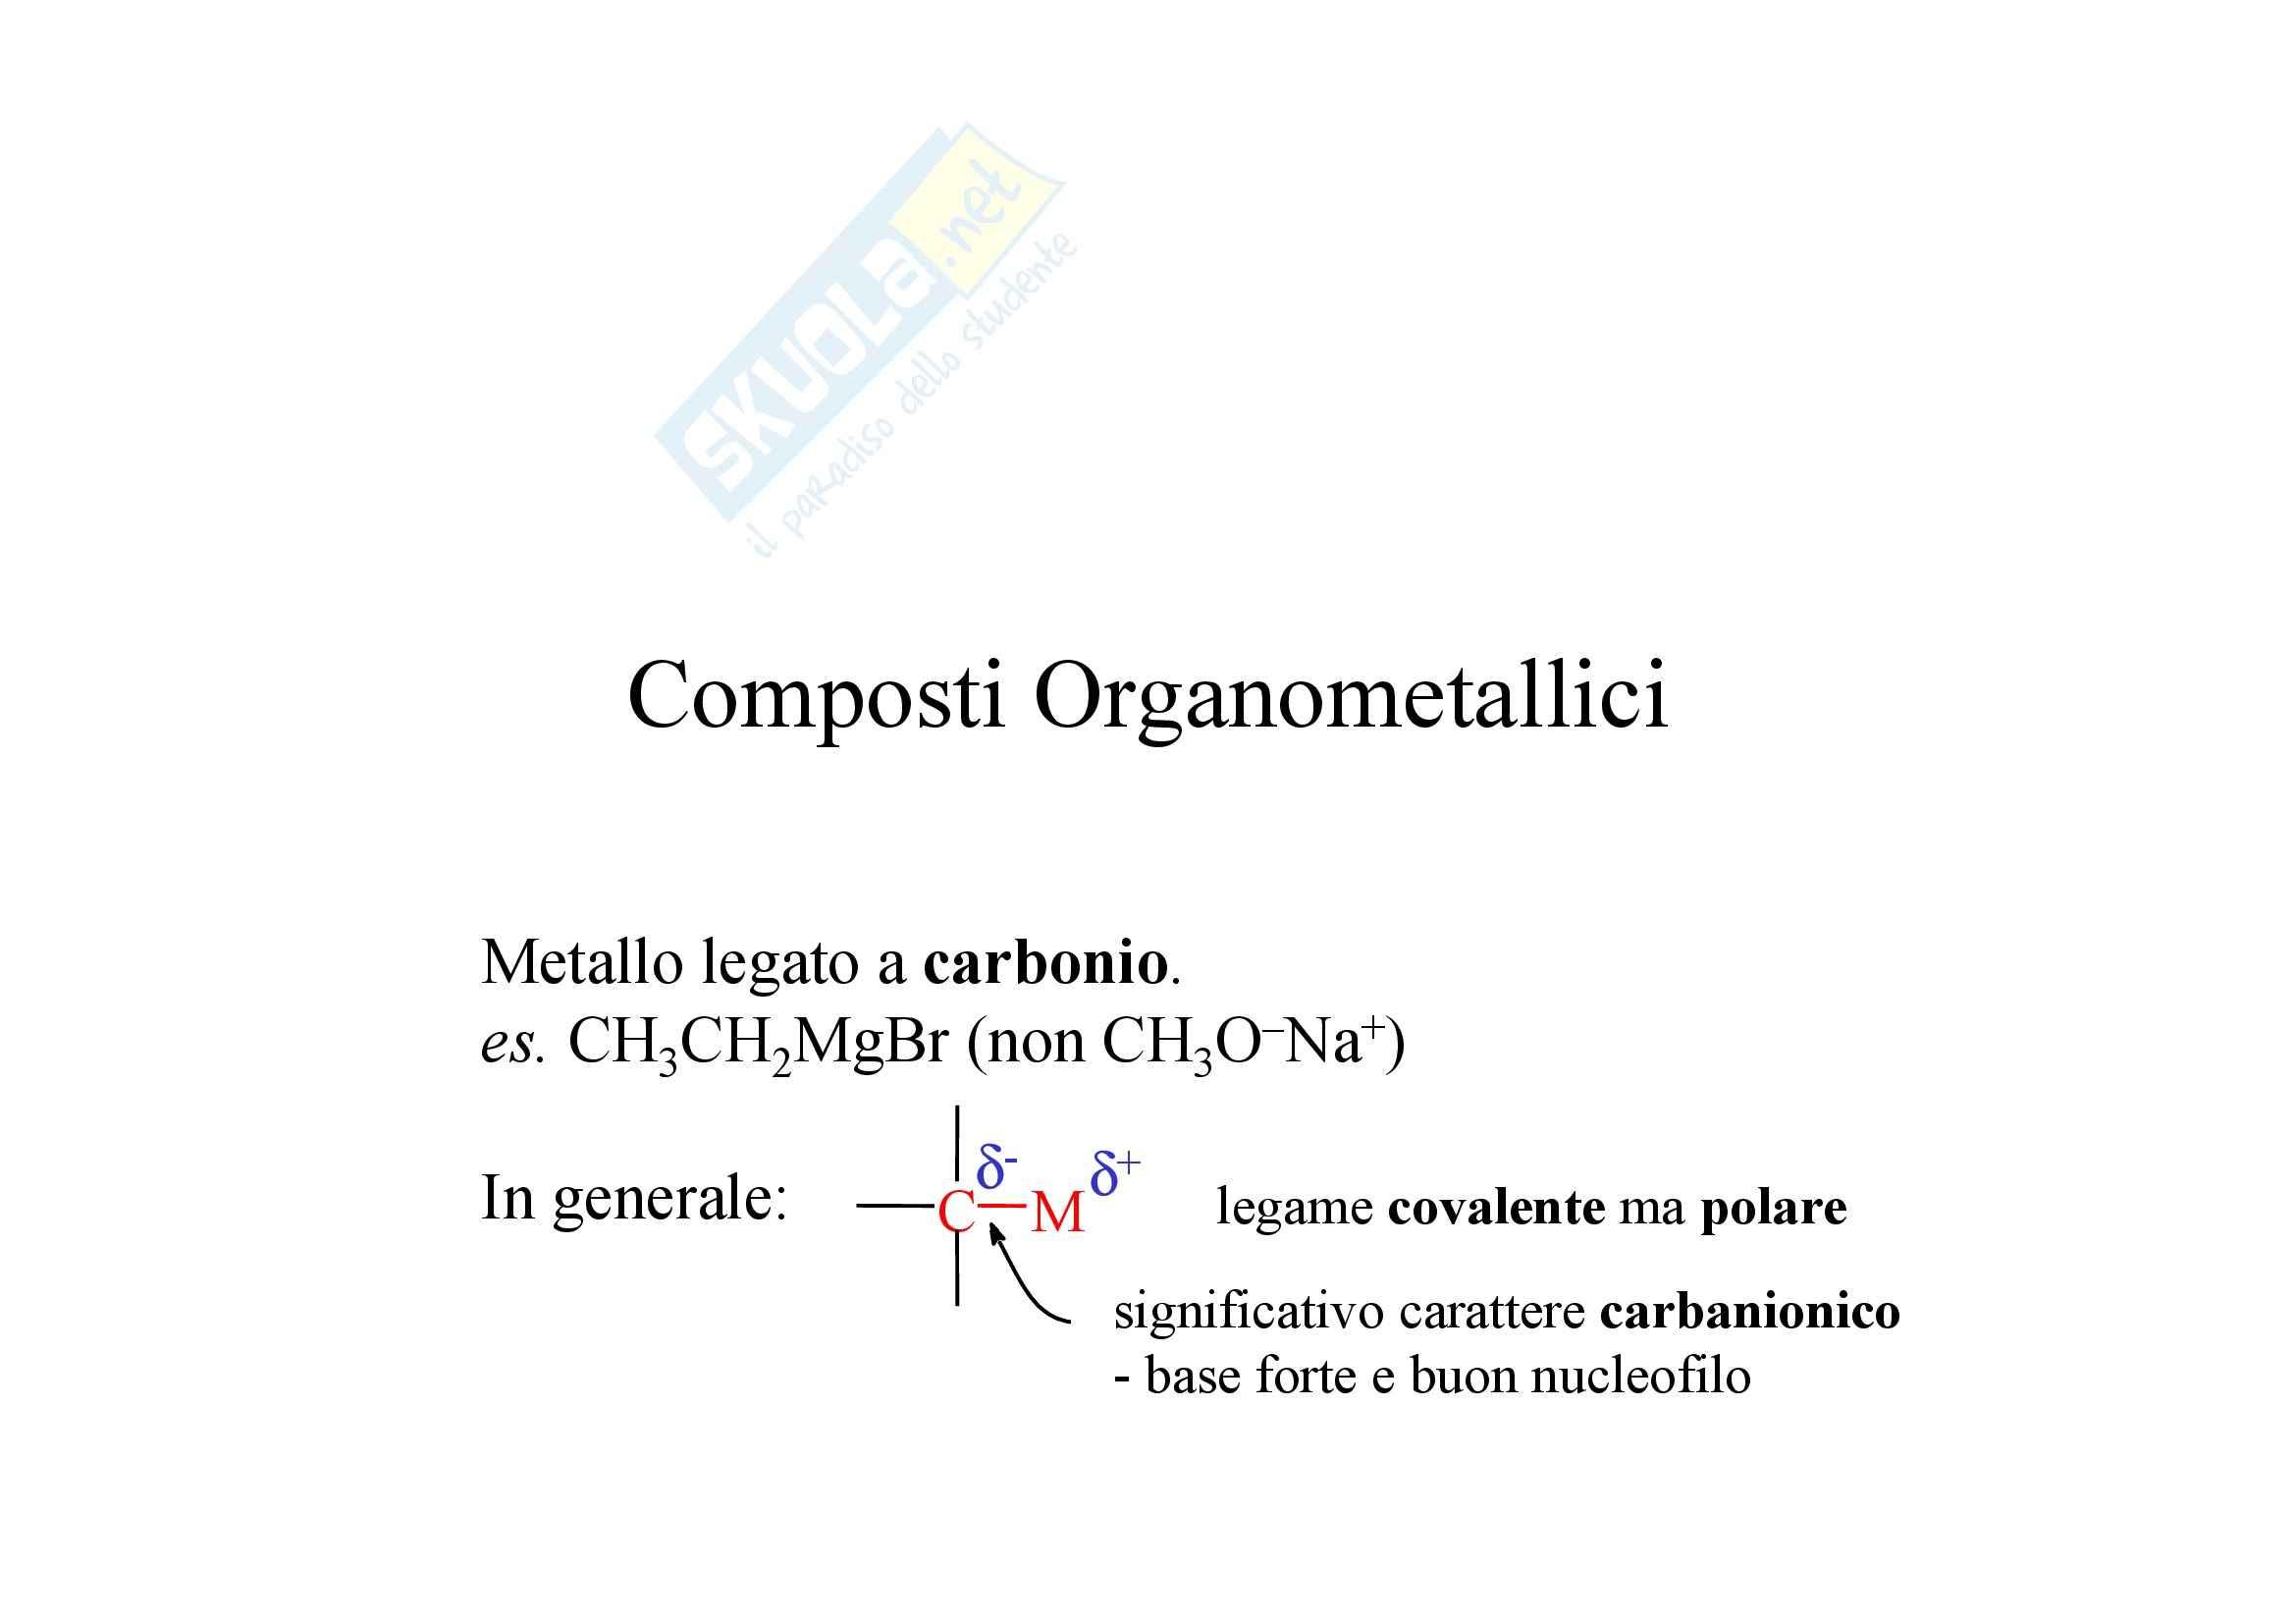 Chimica organica - composti organometallici